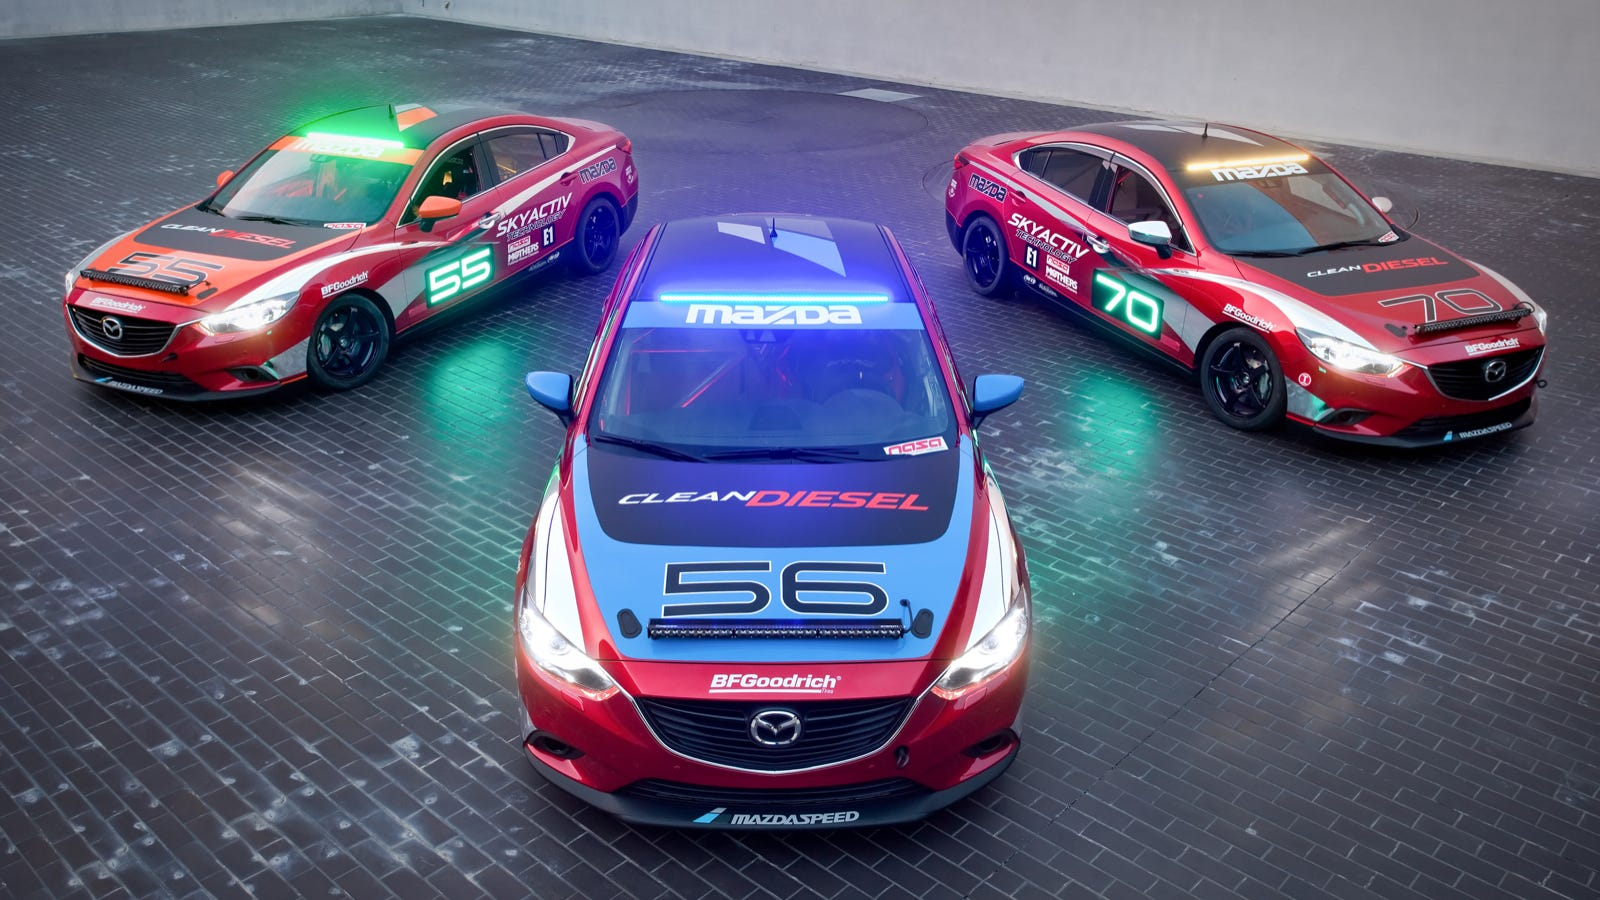 Thunderhill Race Car Wallpaper: Mazda6 Skyactiv-D Clean Diesel Racecars To Tackle